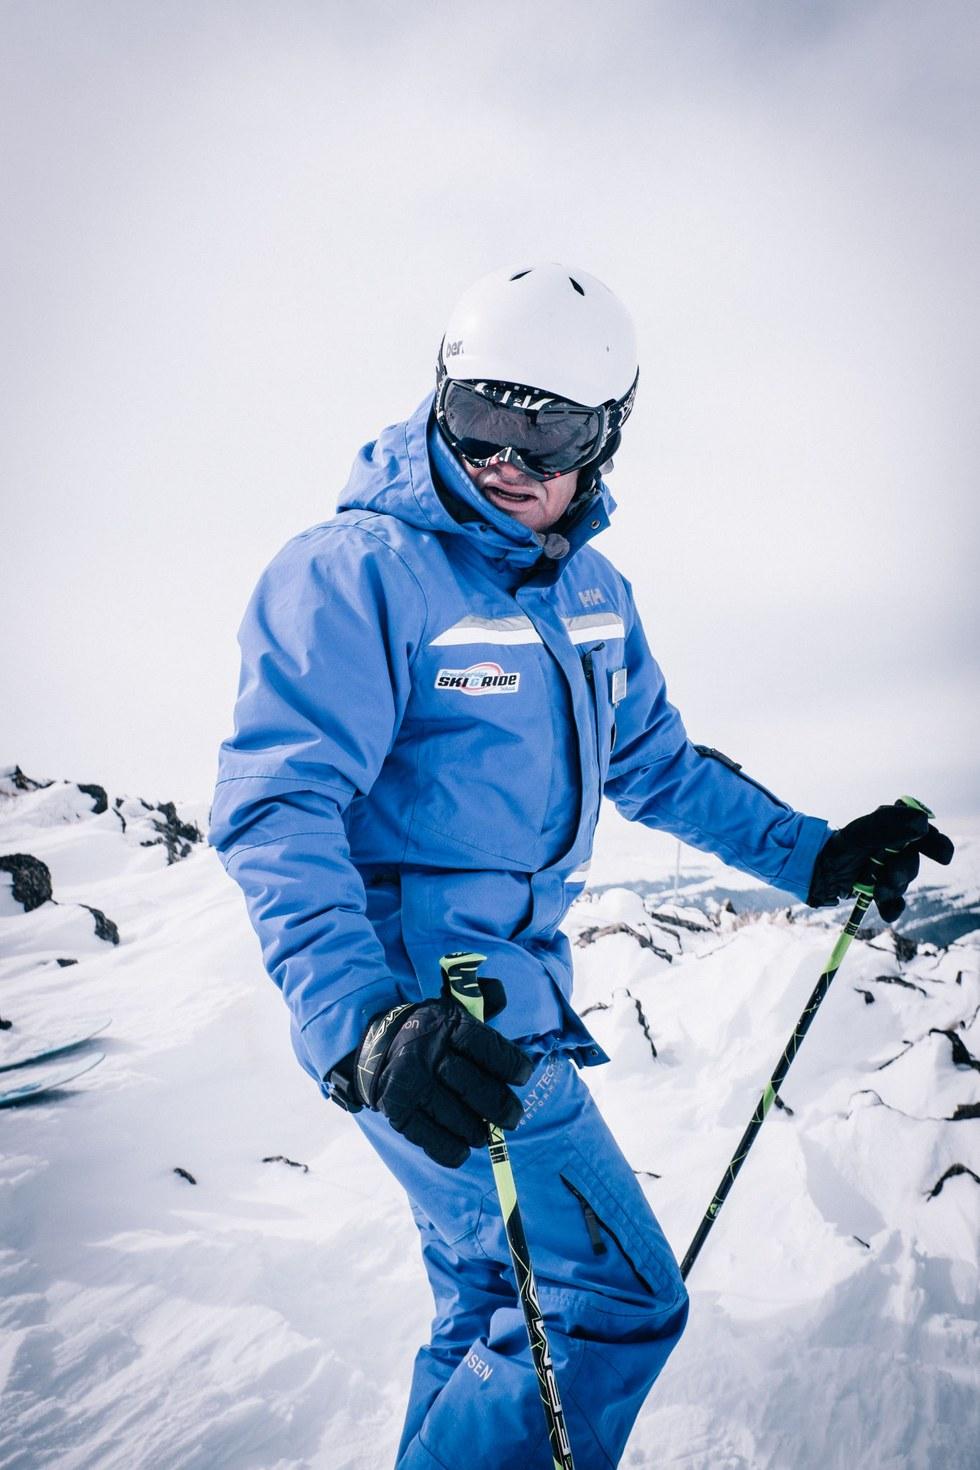 Ski guide Lee Sky takes a breather in Breckenridge